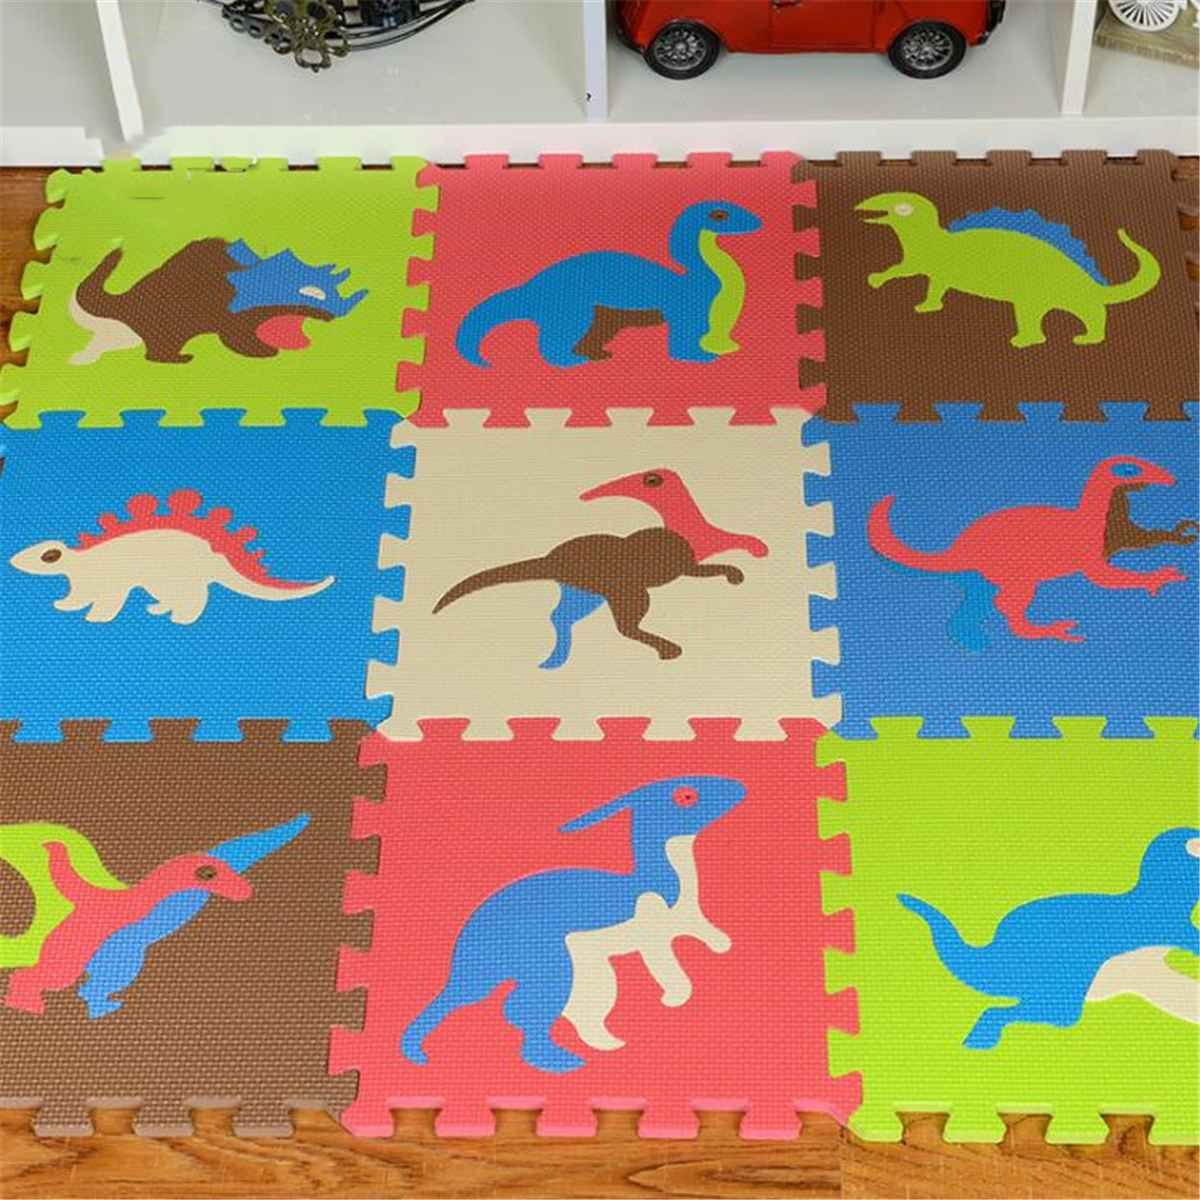 30x30cm Split Joint EVA Baby Play Mat Animal Foam Puzzle Kids Rug Carpet Indoor Soft Puzzle Mats Fold Dino Baby Carpet 9pcs